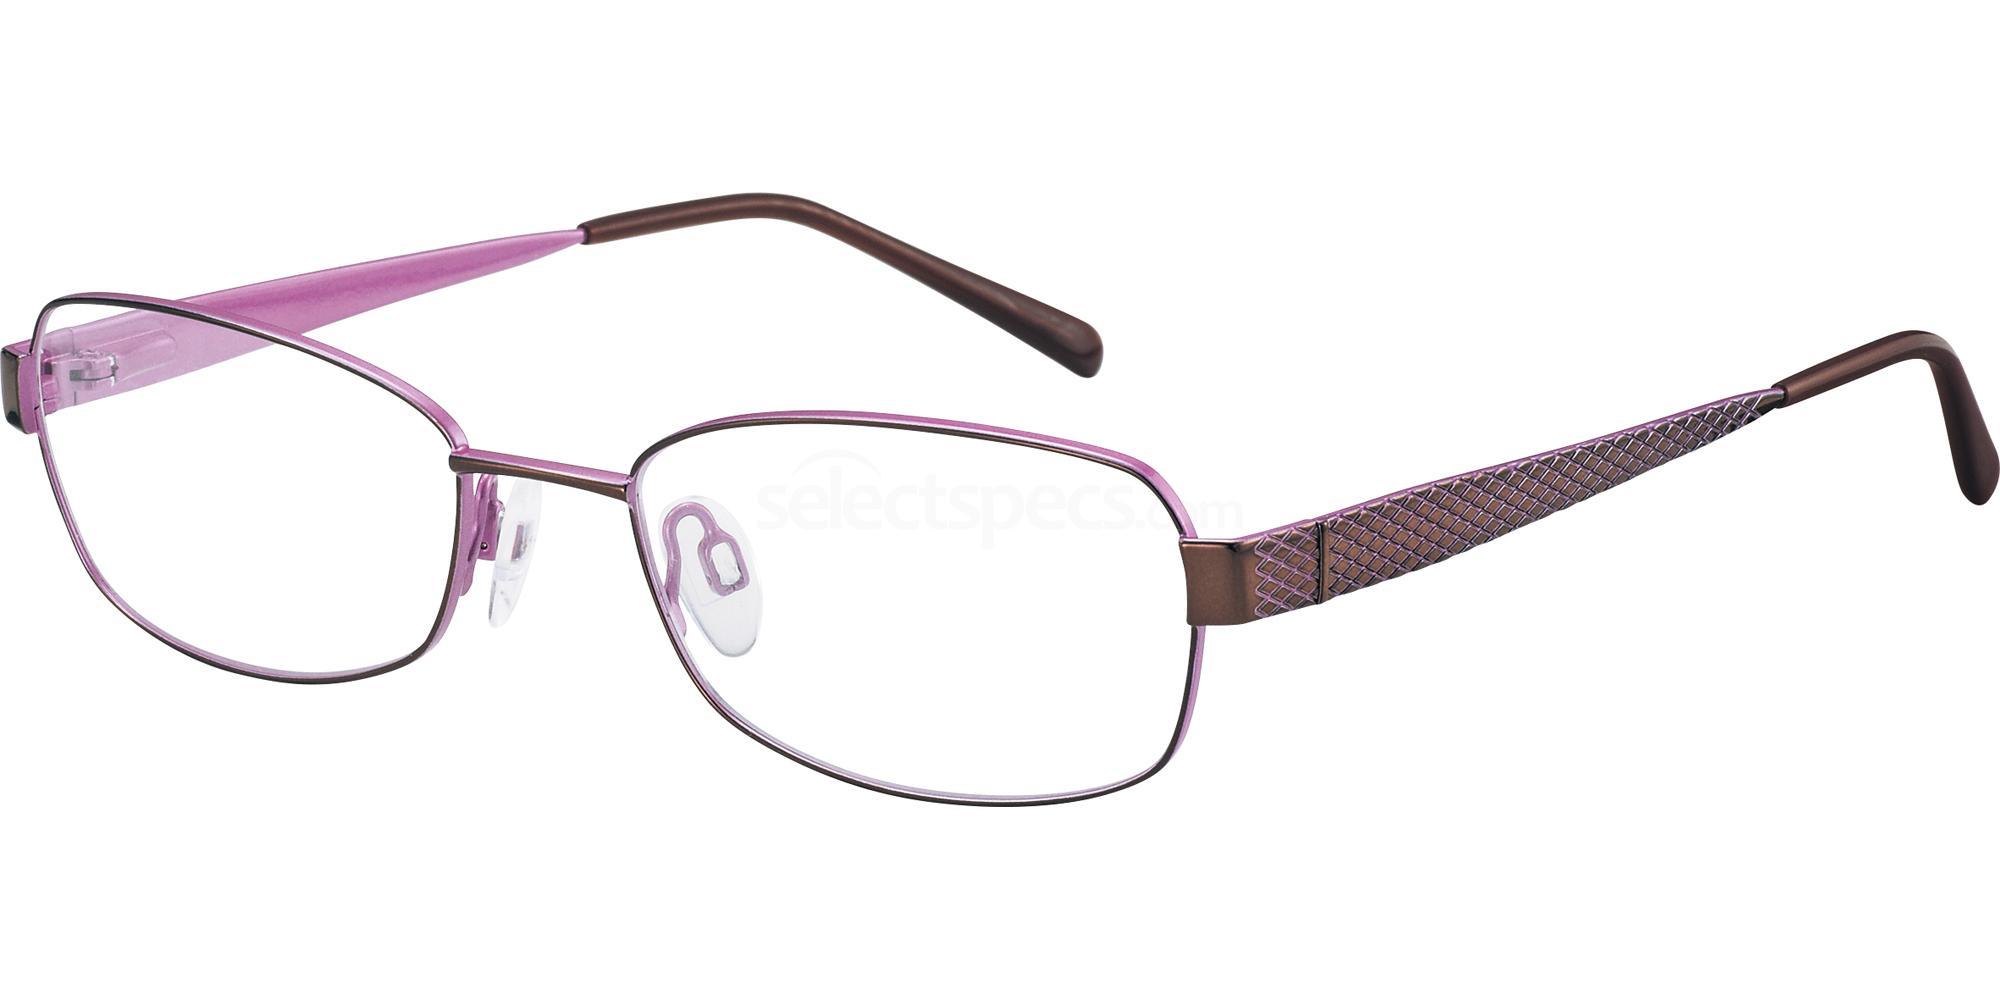 564 AR16345 Glasses, Aristar